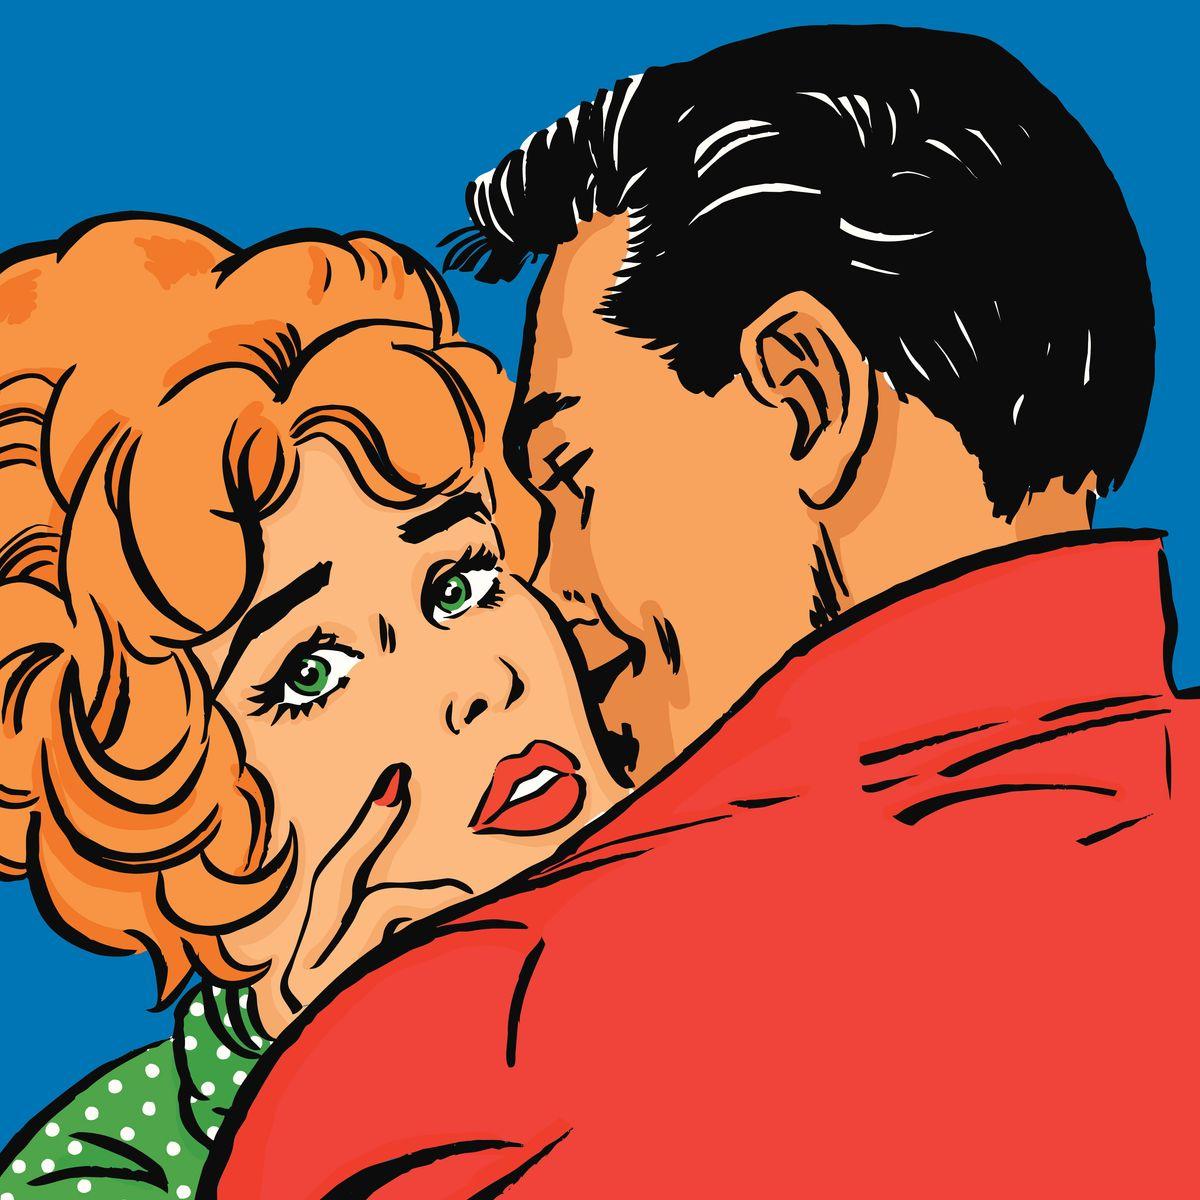 With affair to man how a married an avoid Learn How